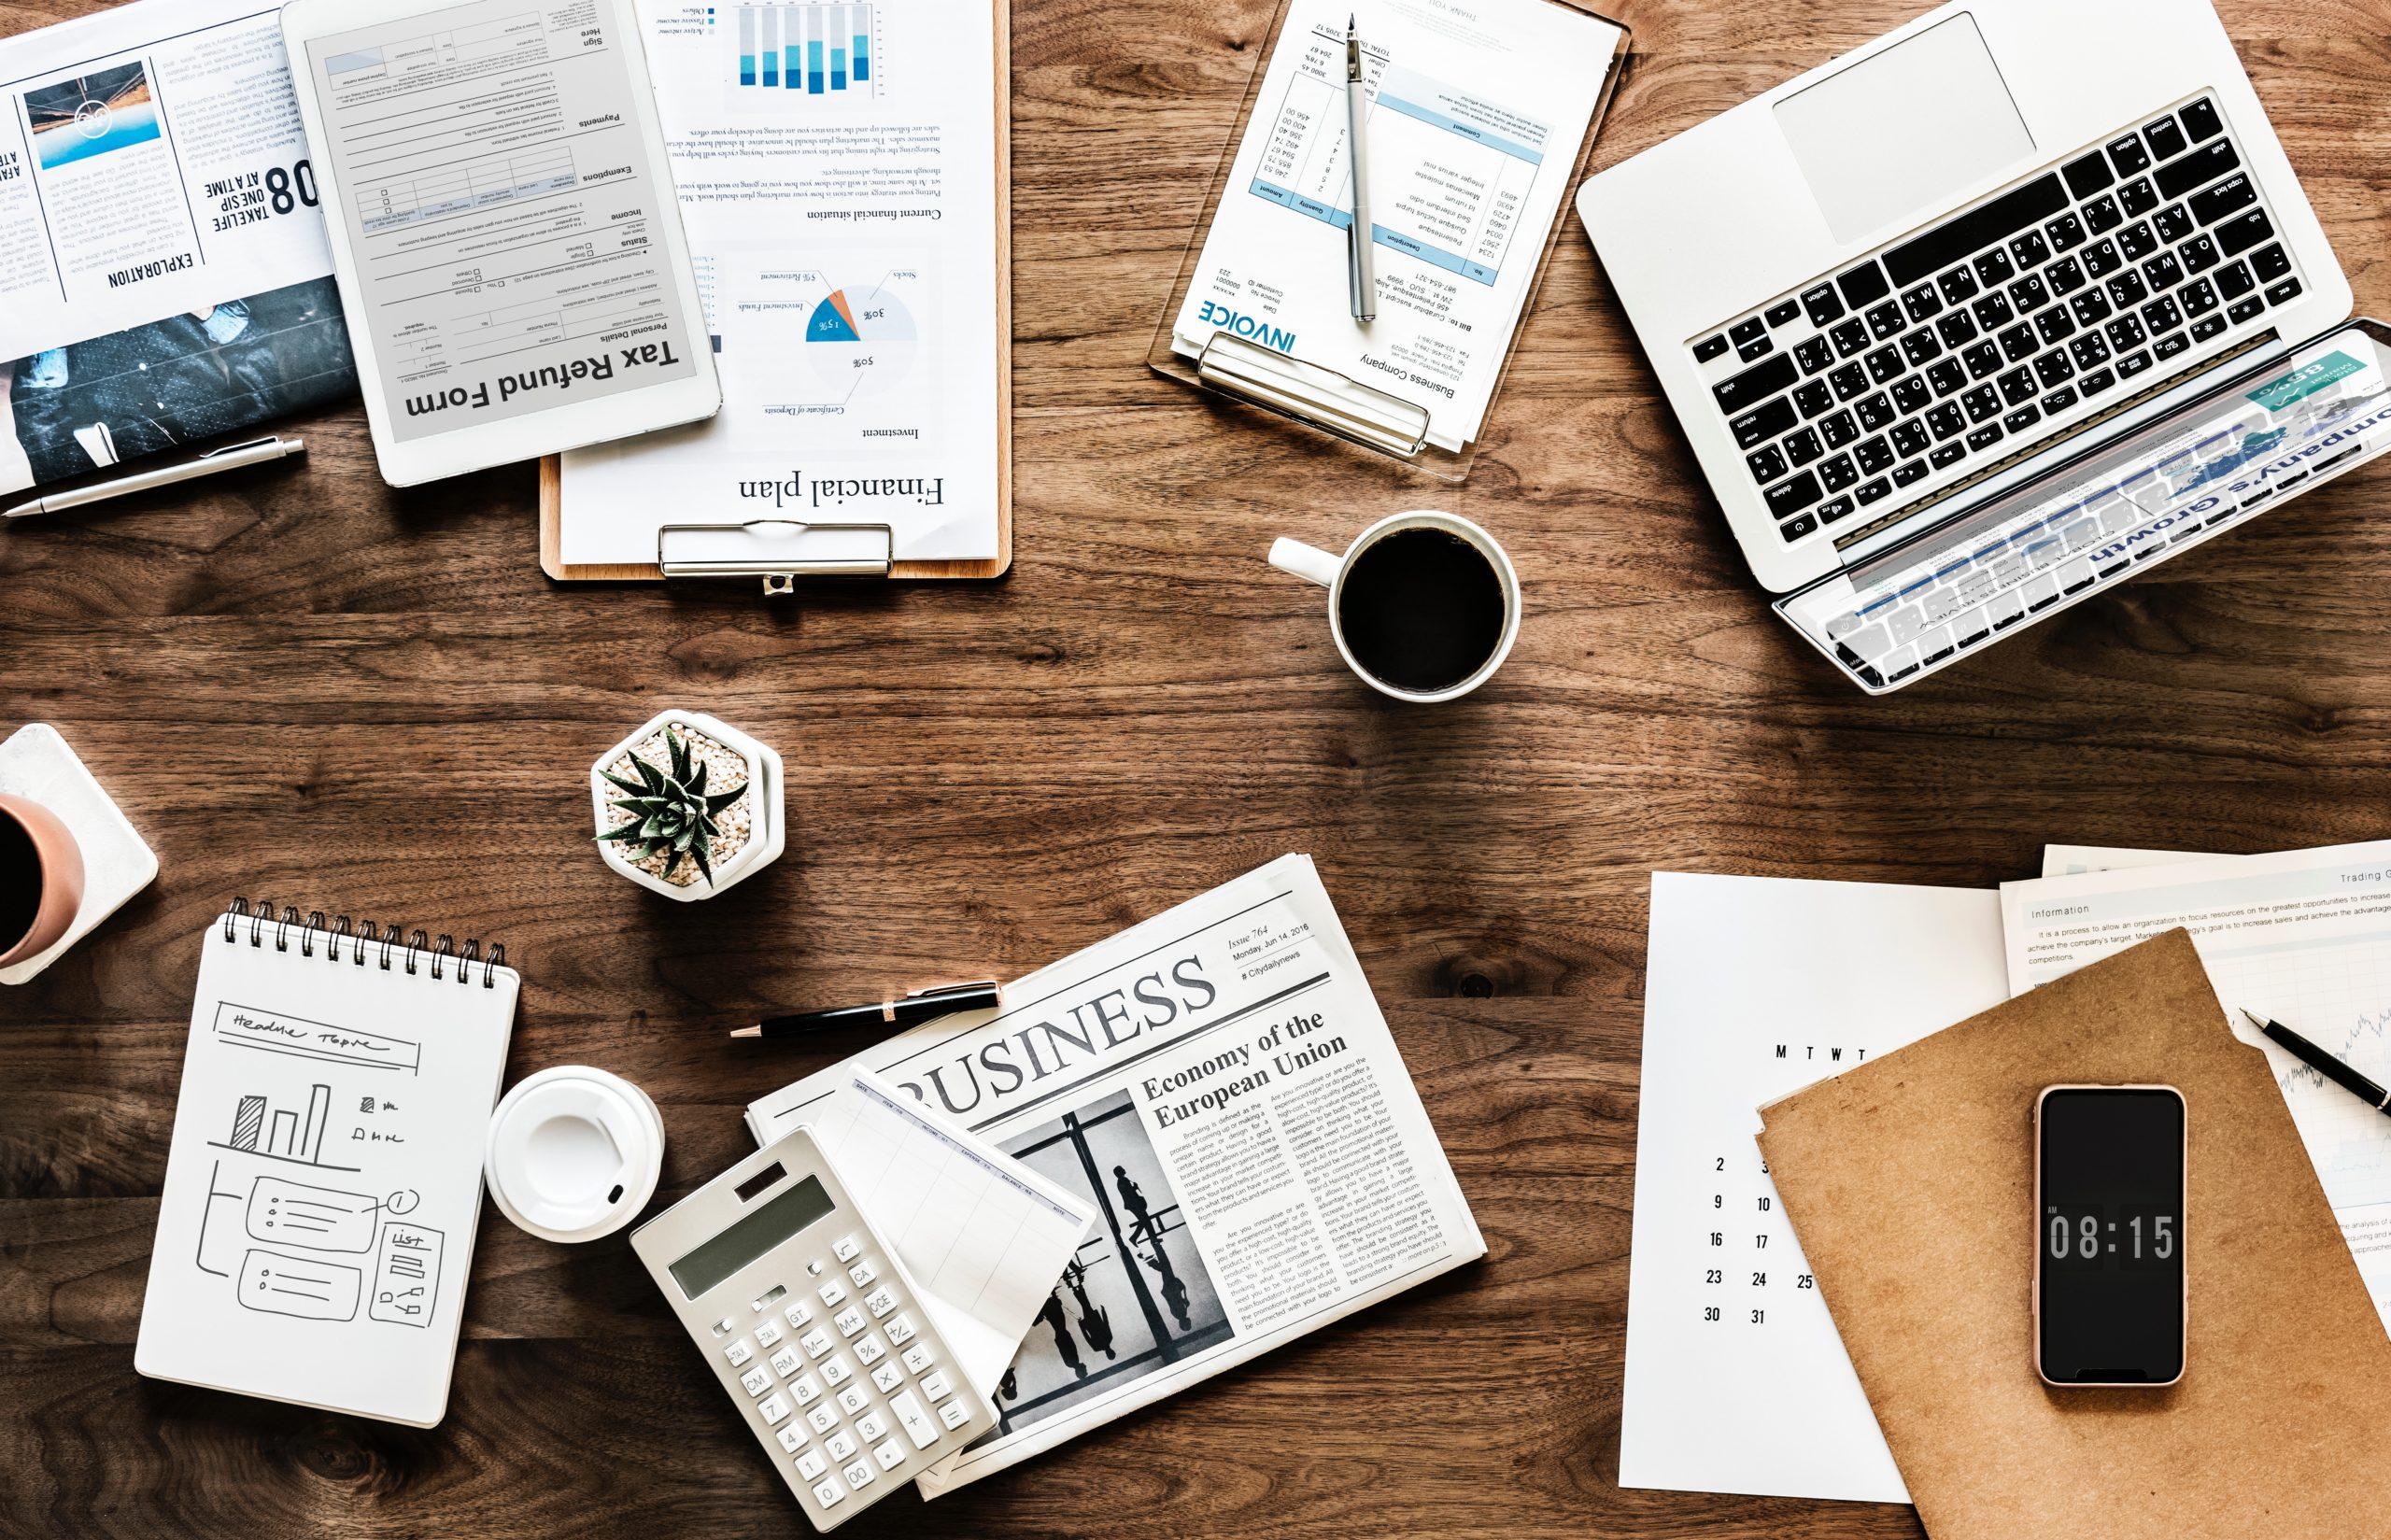 Digital Commerce Marketing